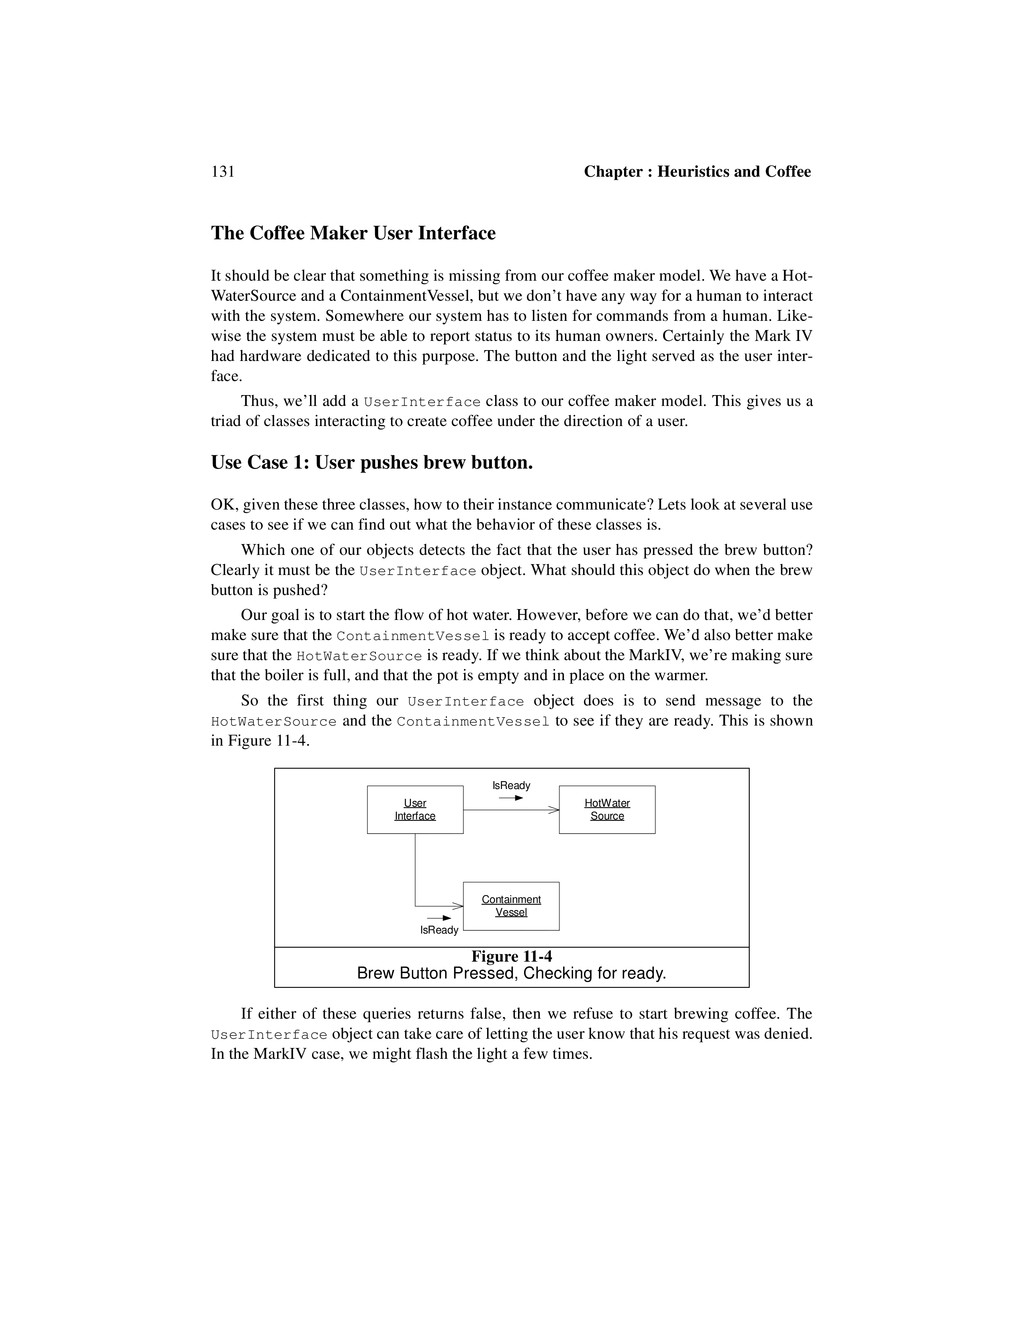 131 Chapter : Heuristics and Coffee The Coffee ...